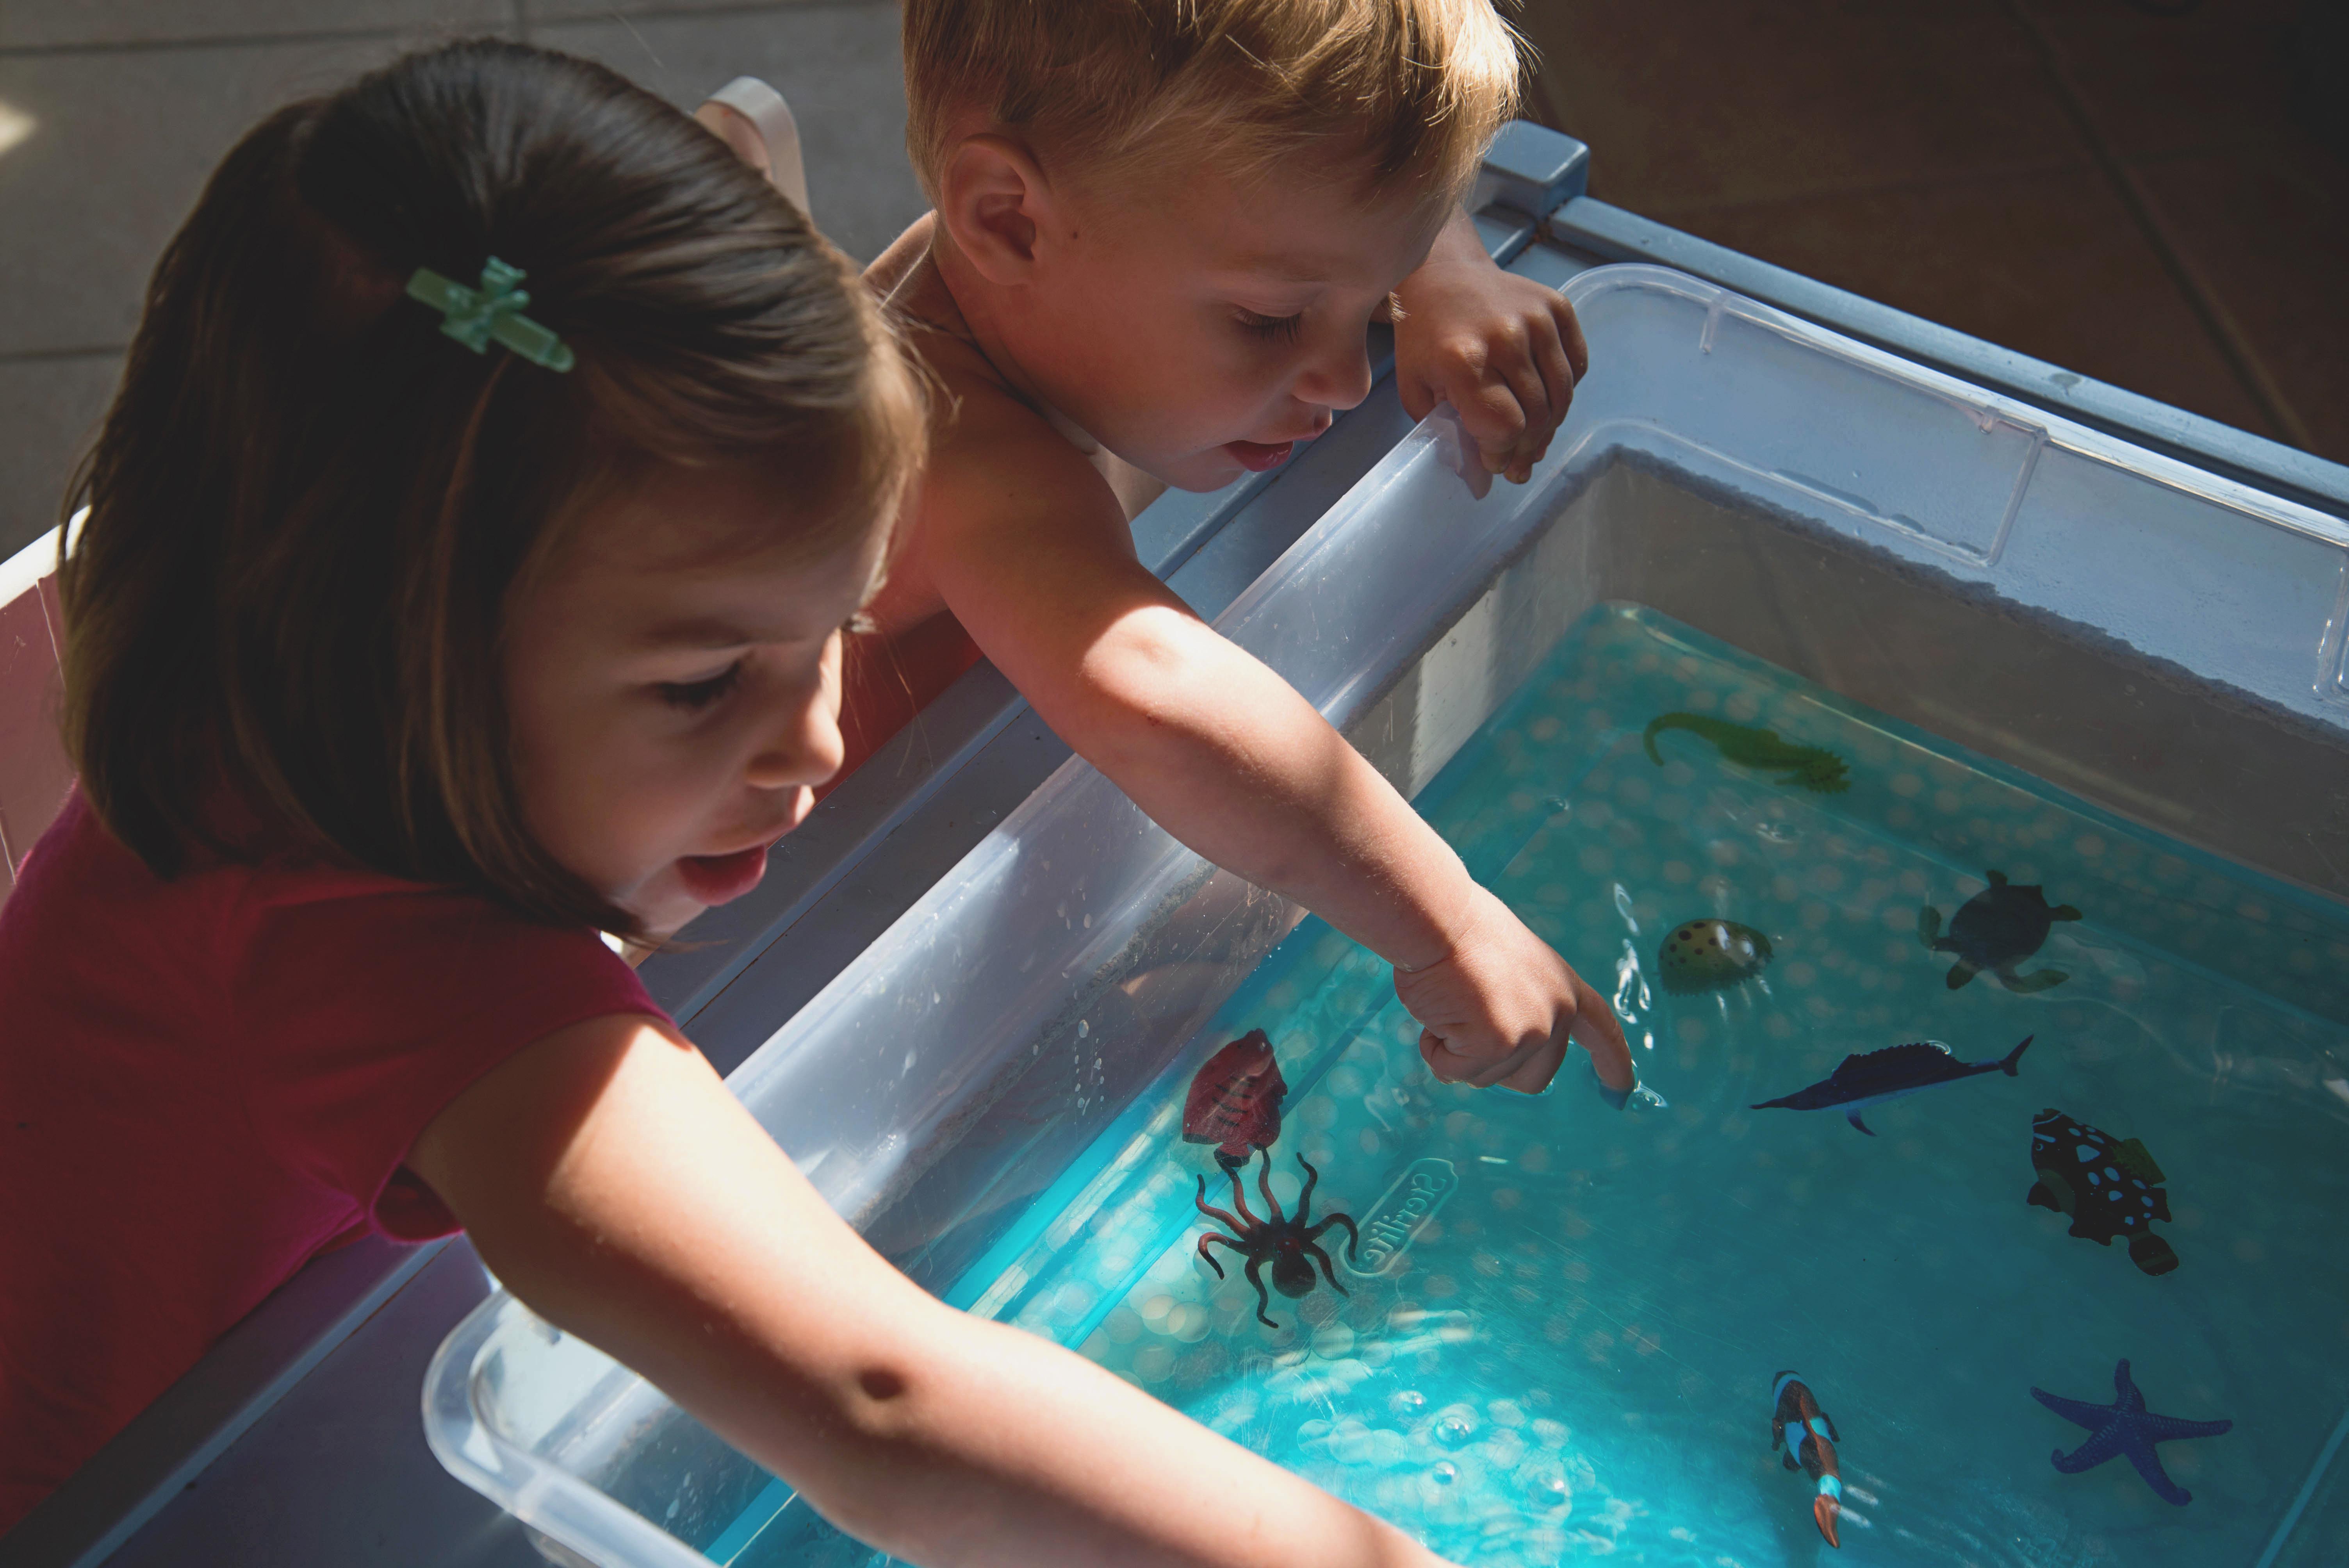 Babes in Deutschland, Simple Ocean Sensory Bin with water beads